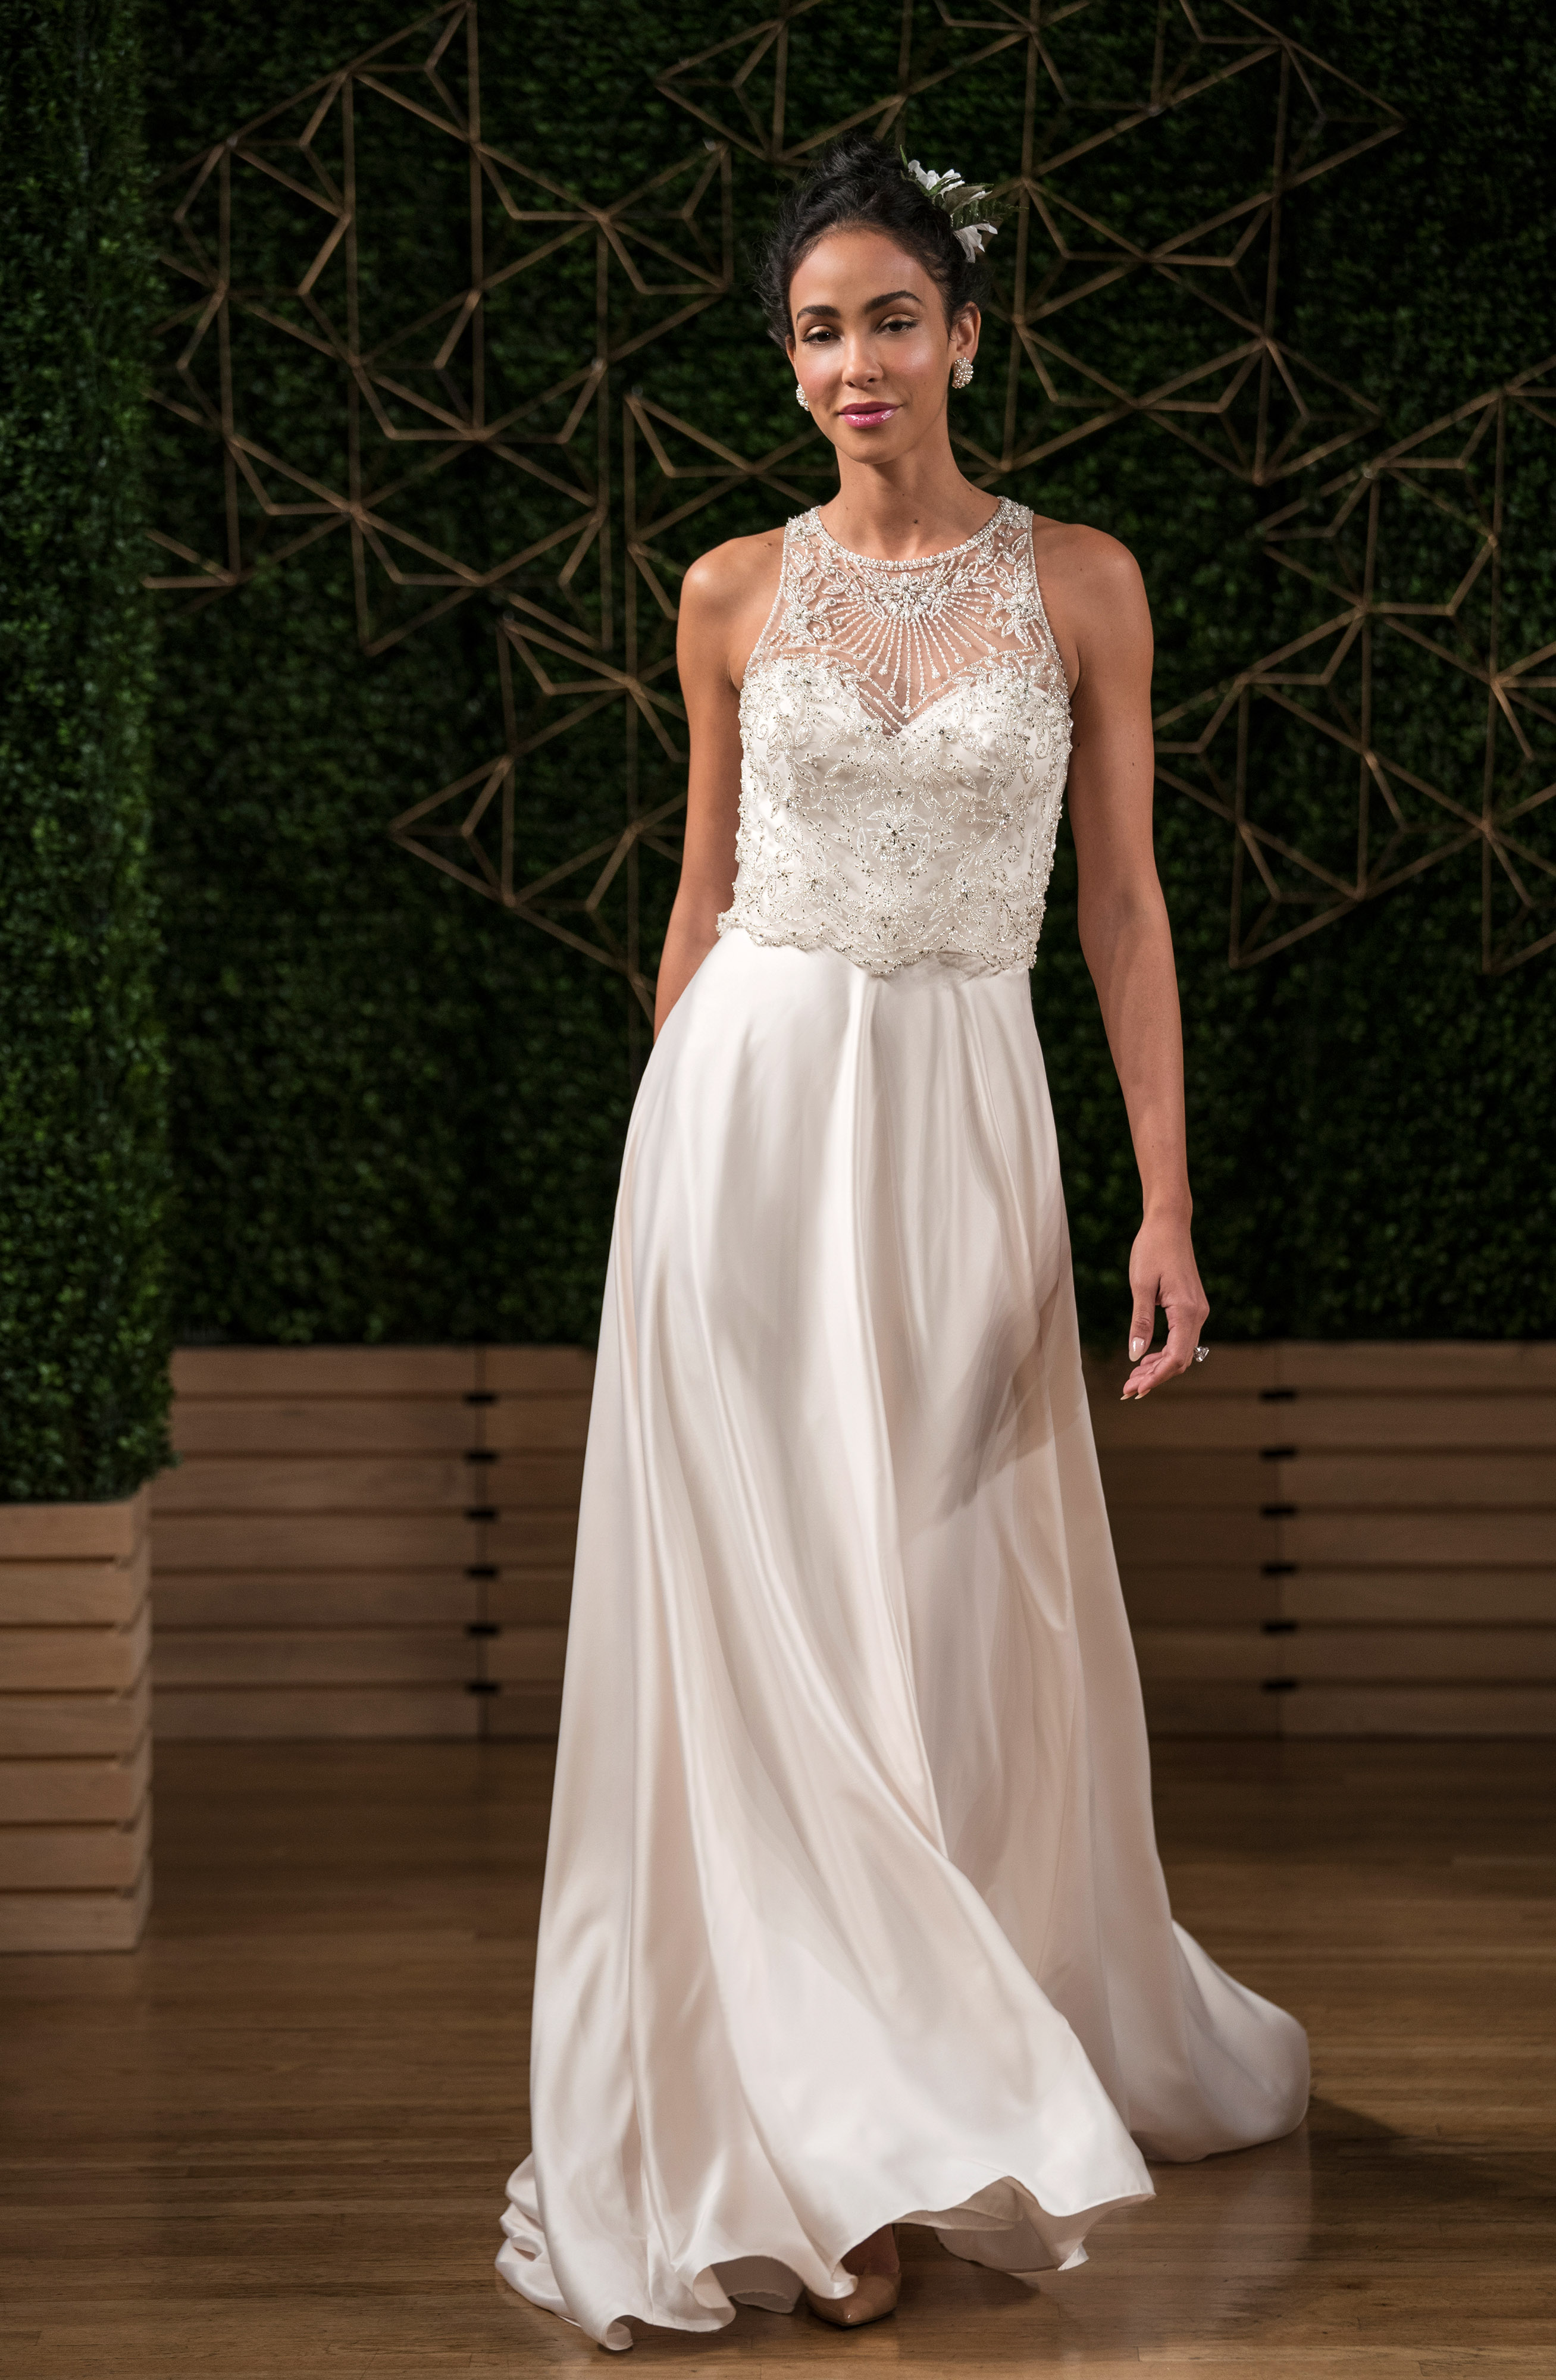 maggie sottero wedding dress fall 2018 a-line embellished sleeveless